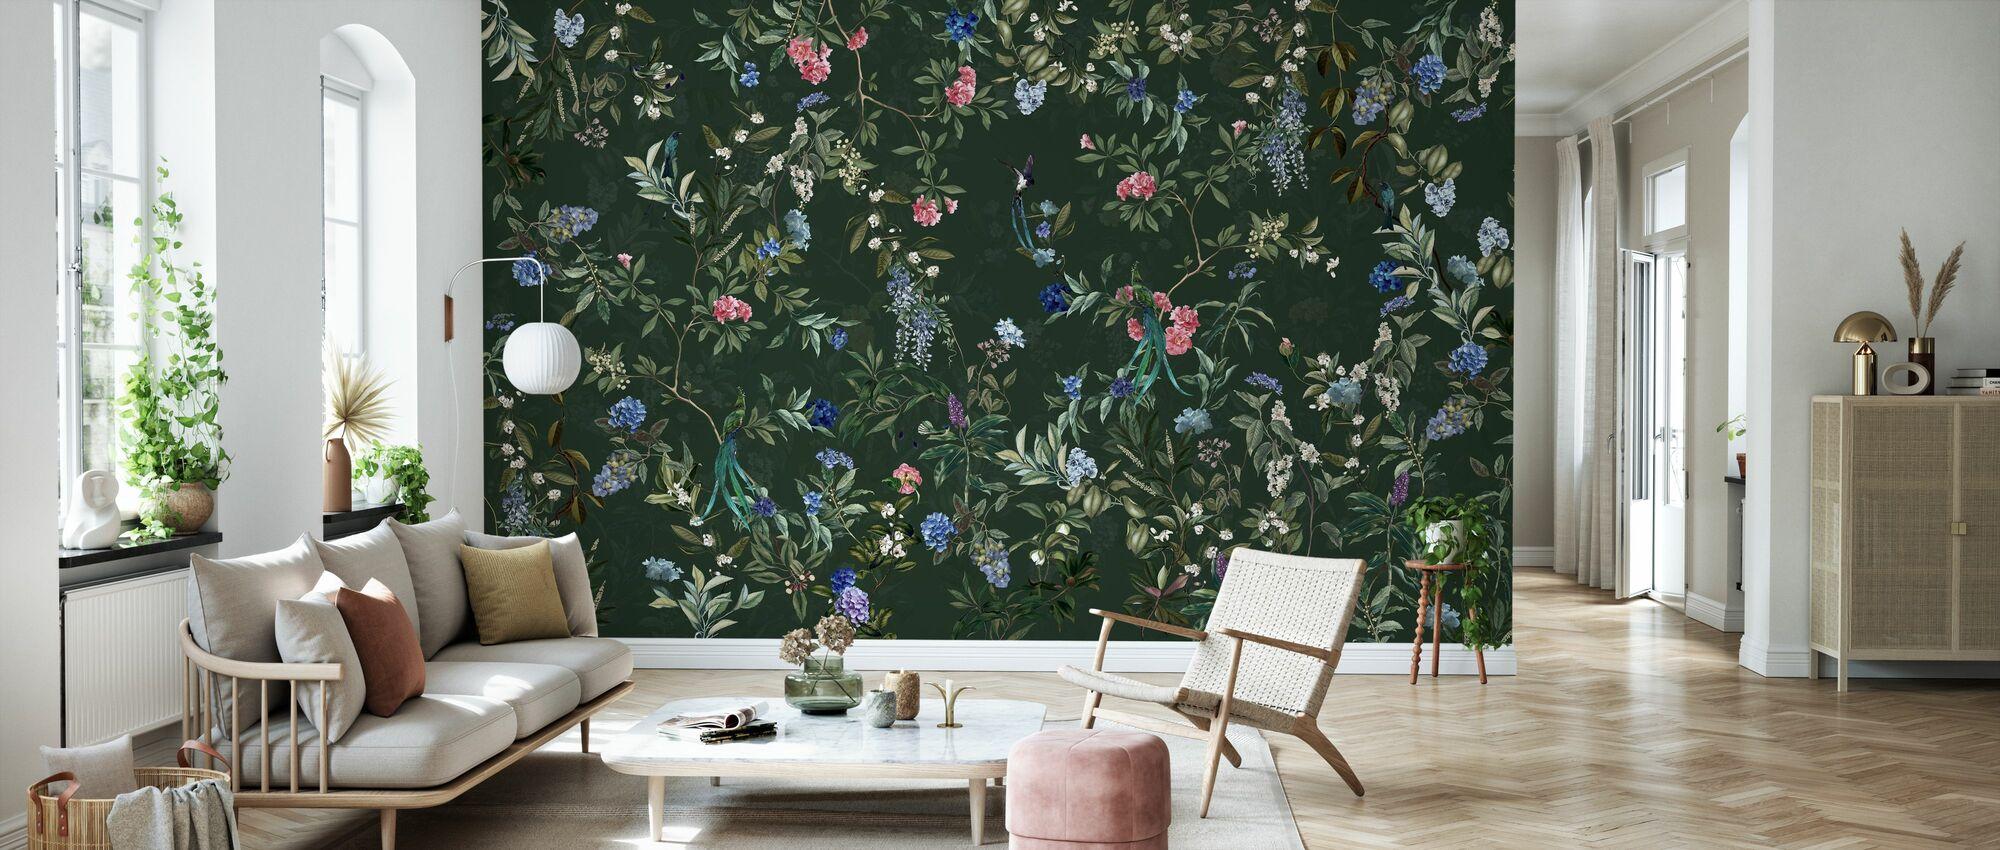 Magic Forest - Green - Wallpaper - Living Room